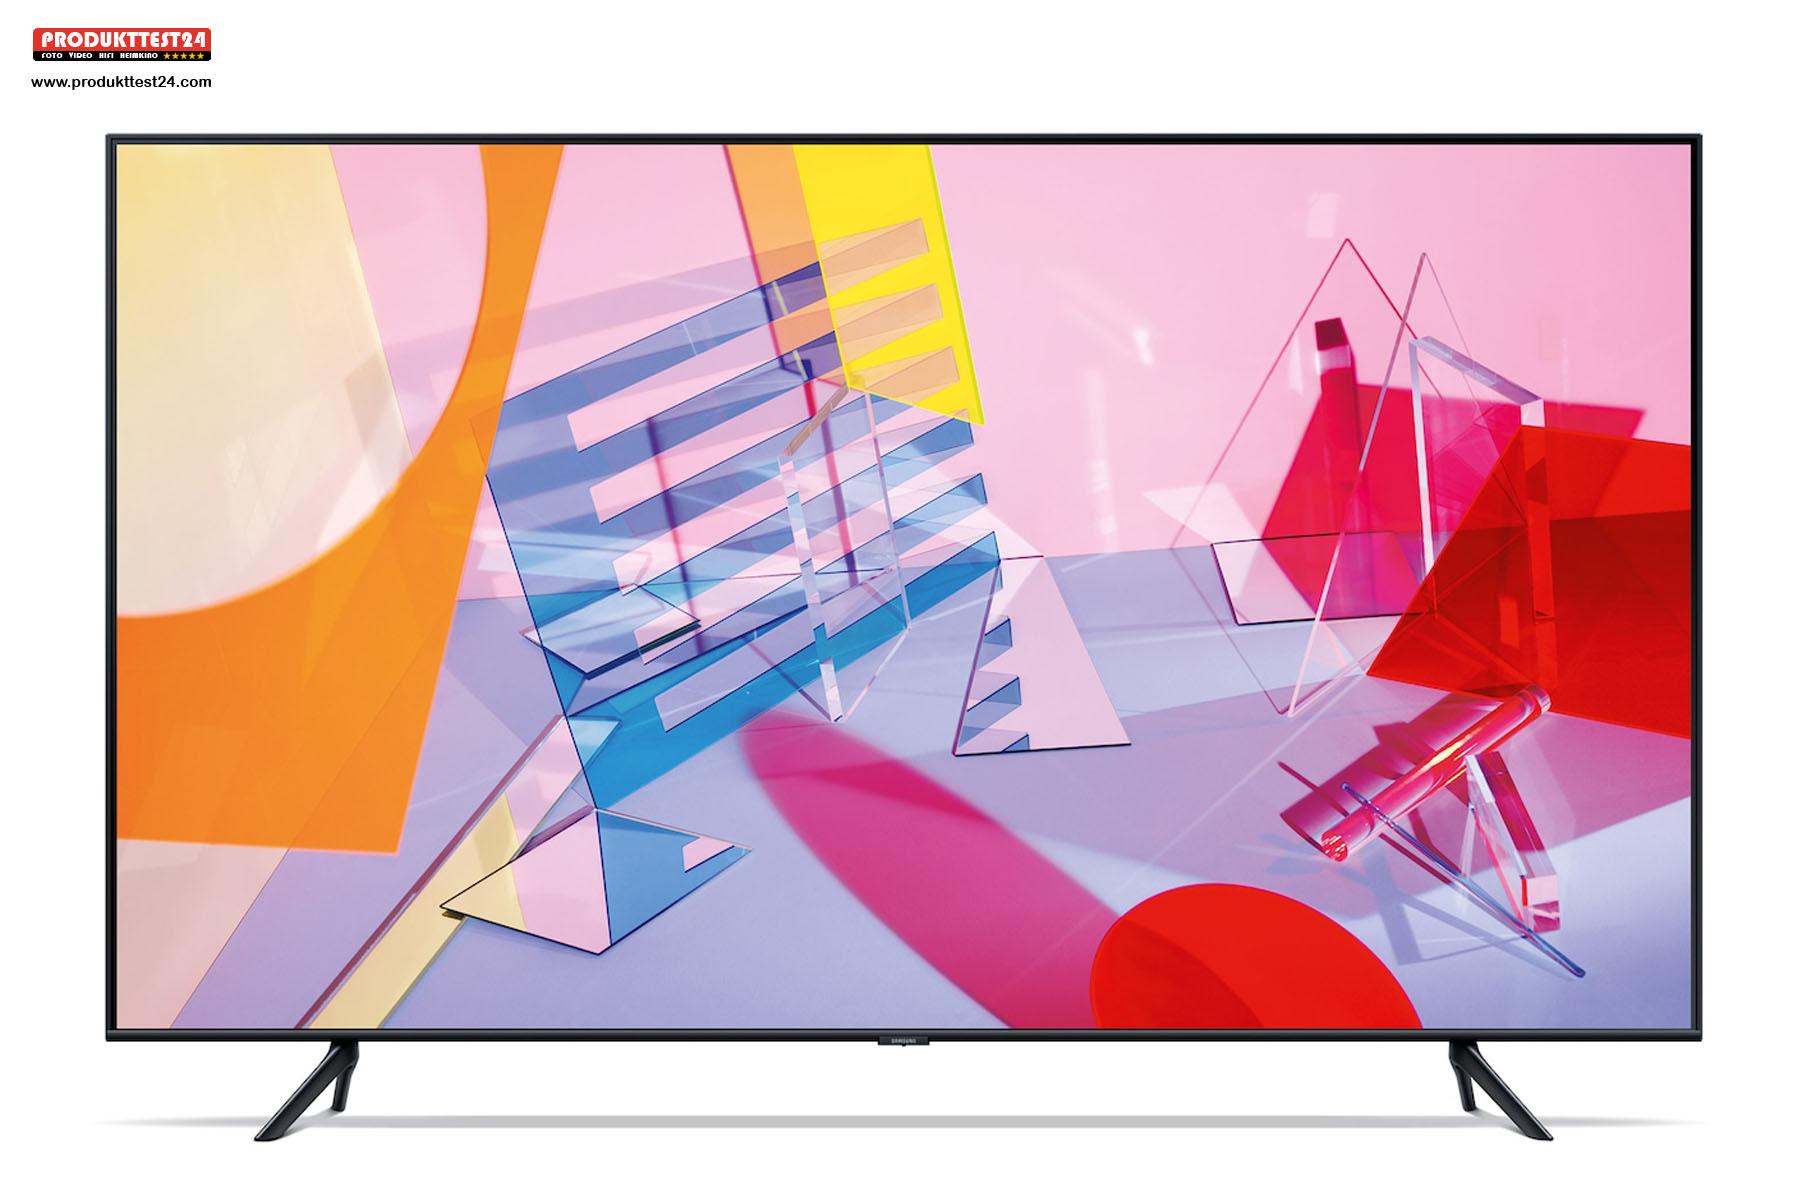 Samsung GQ65Q60T mit 163 cm Displaydiagonale